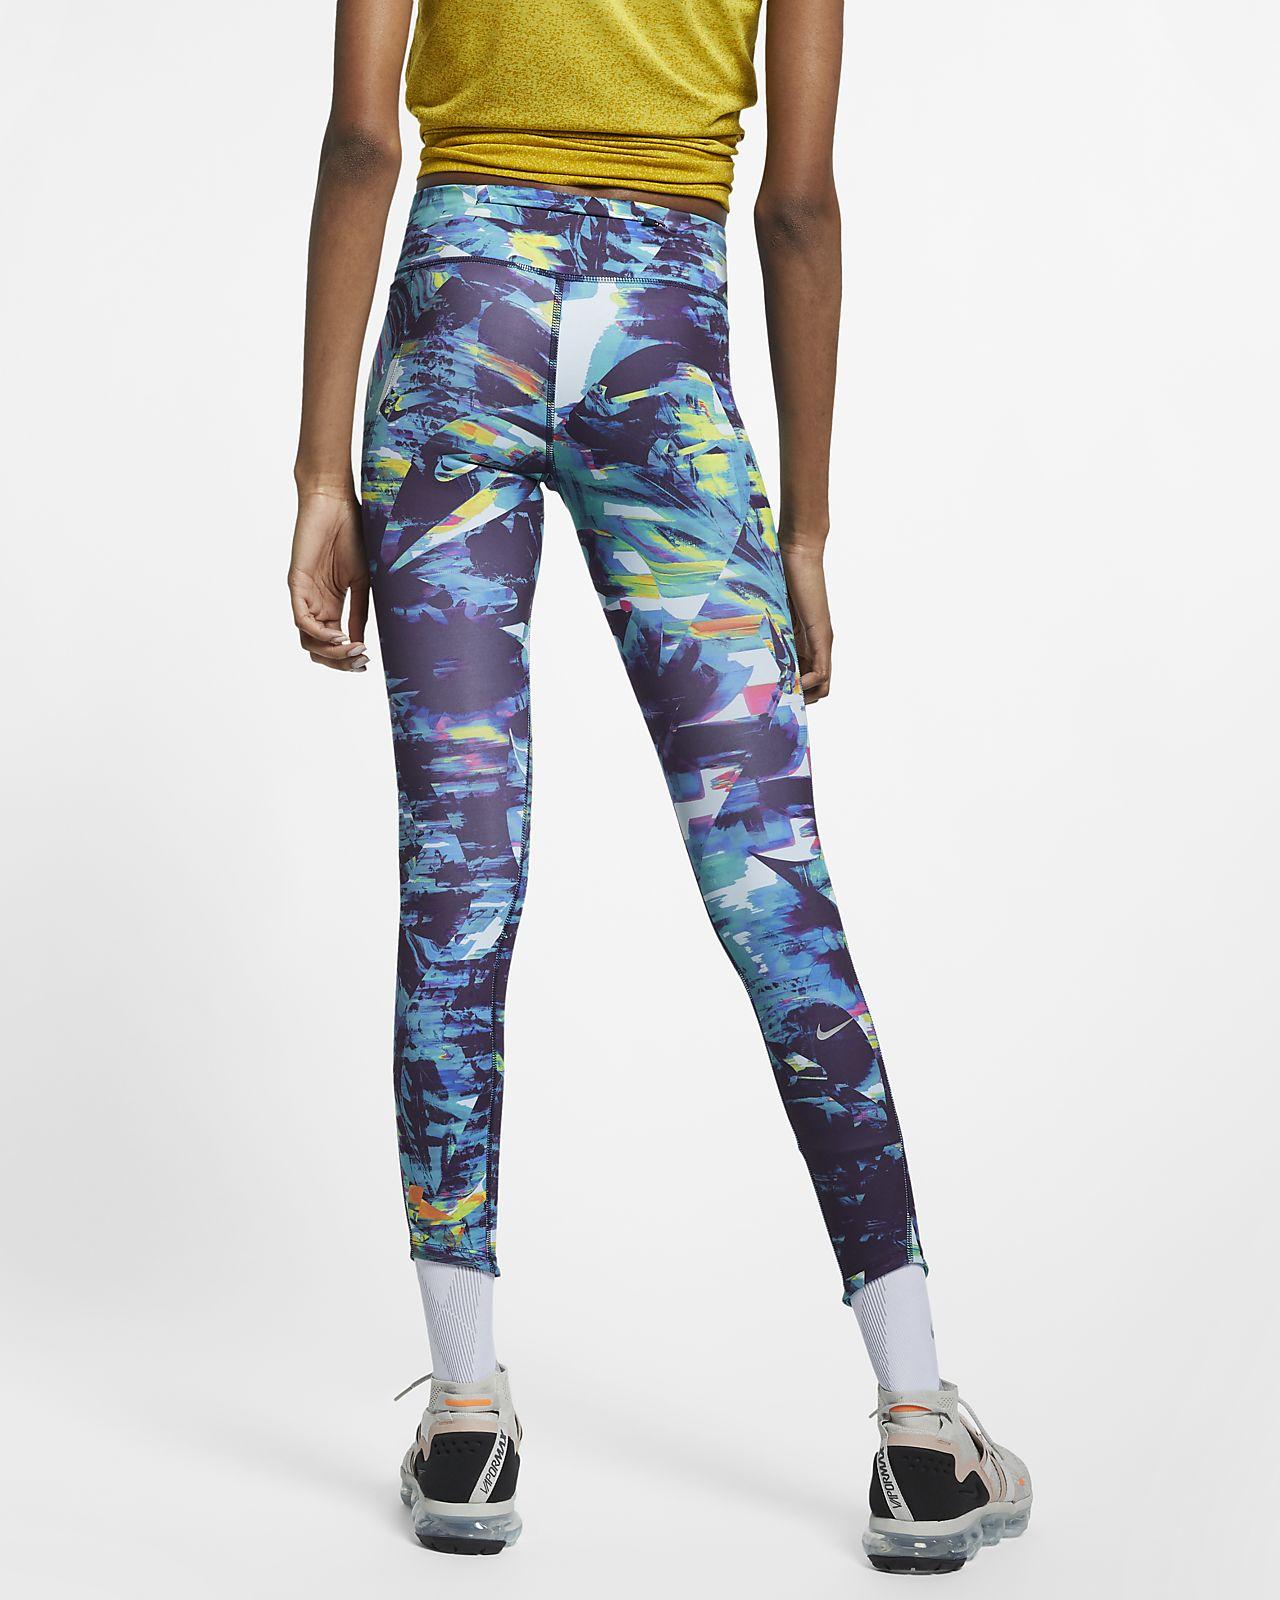 cheaper e0f32 8386b Nike Epic Lux Women s Printed Running Tights. Nike.com ZA